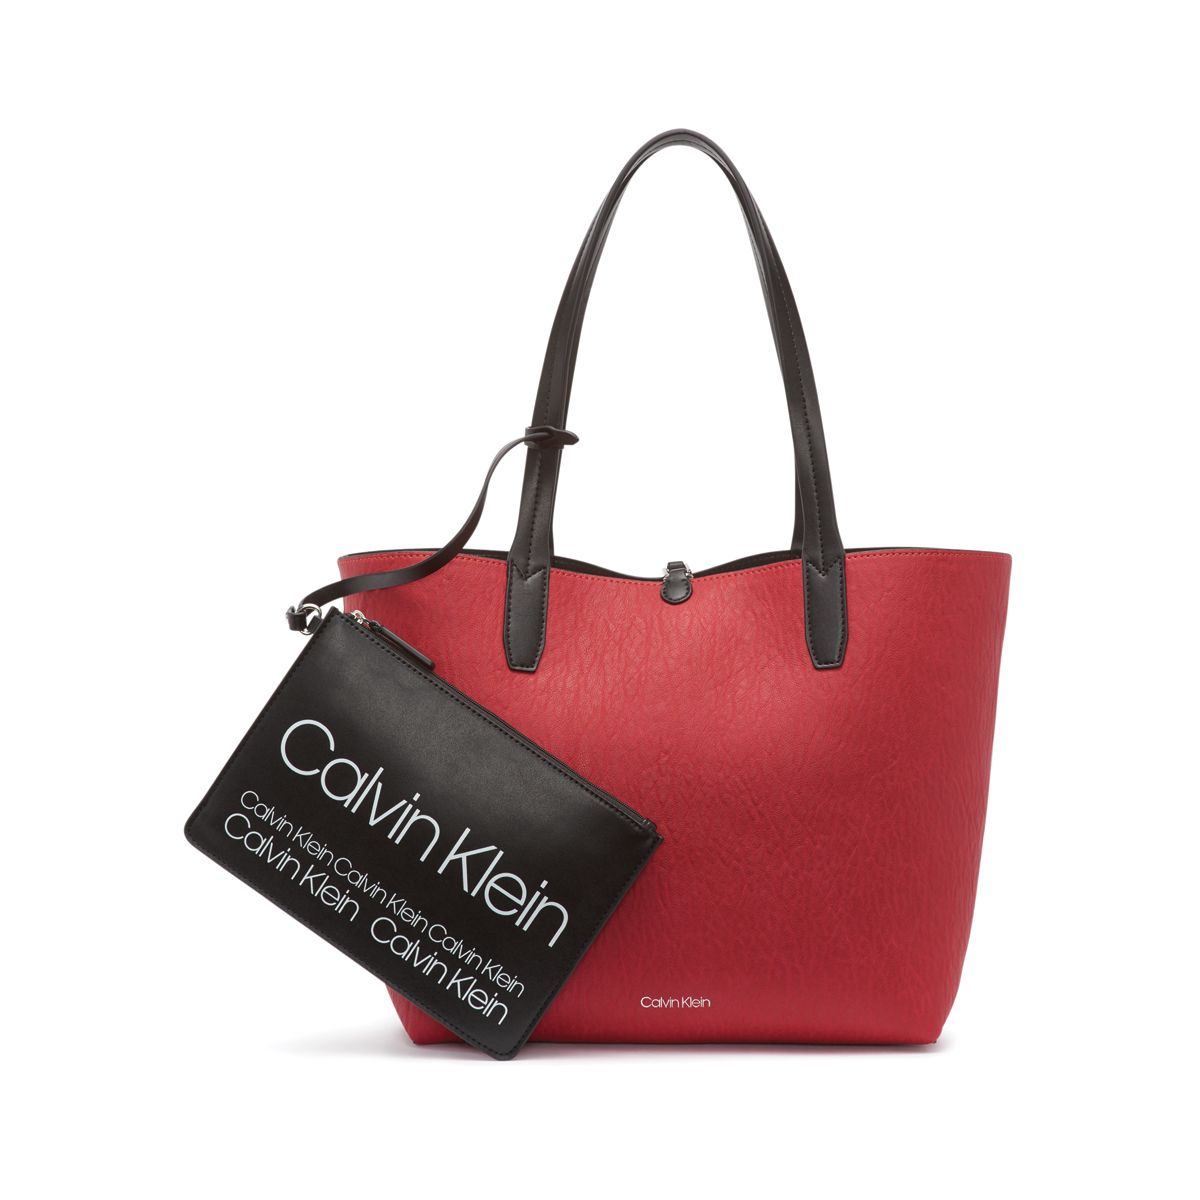 24681baa4e Calvin Klein Tote Bags - Macy's